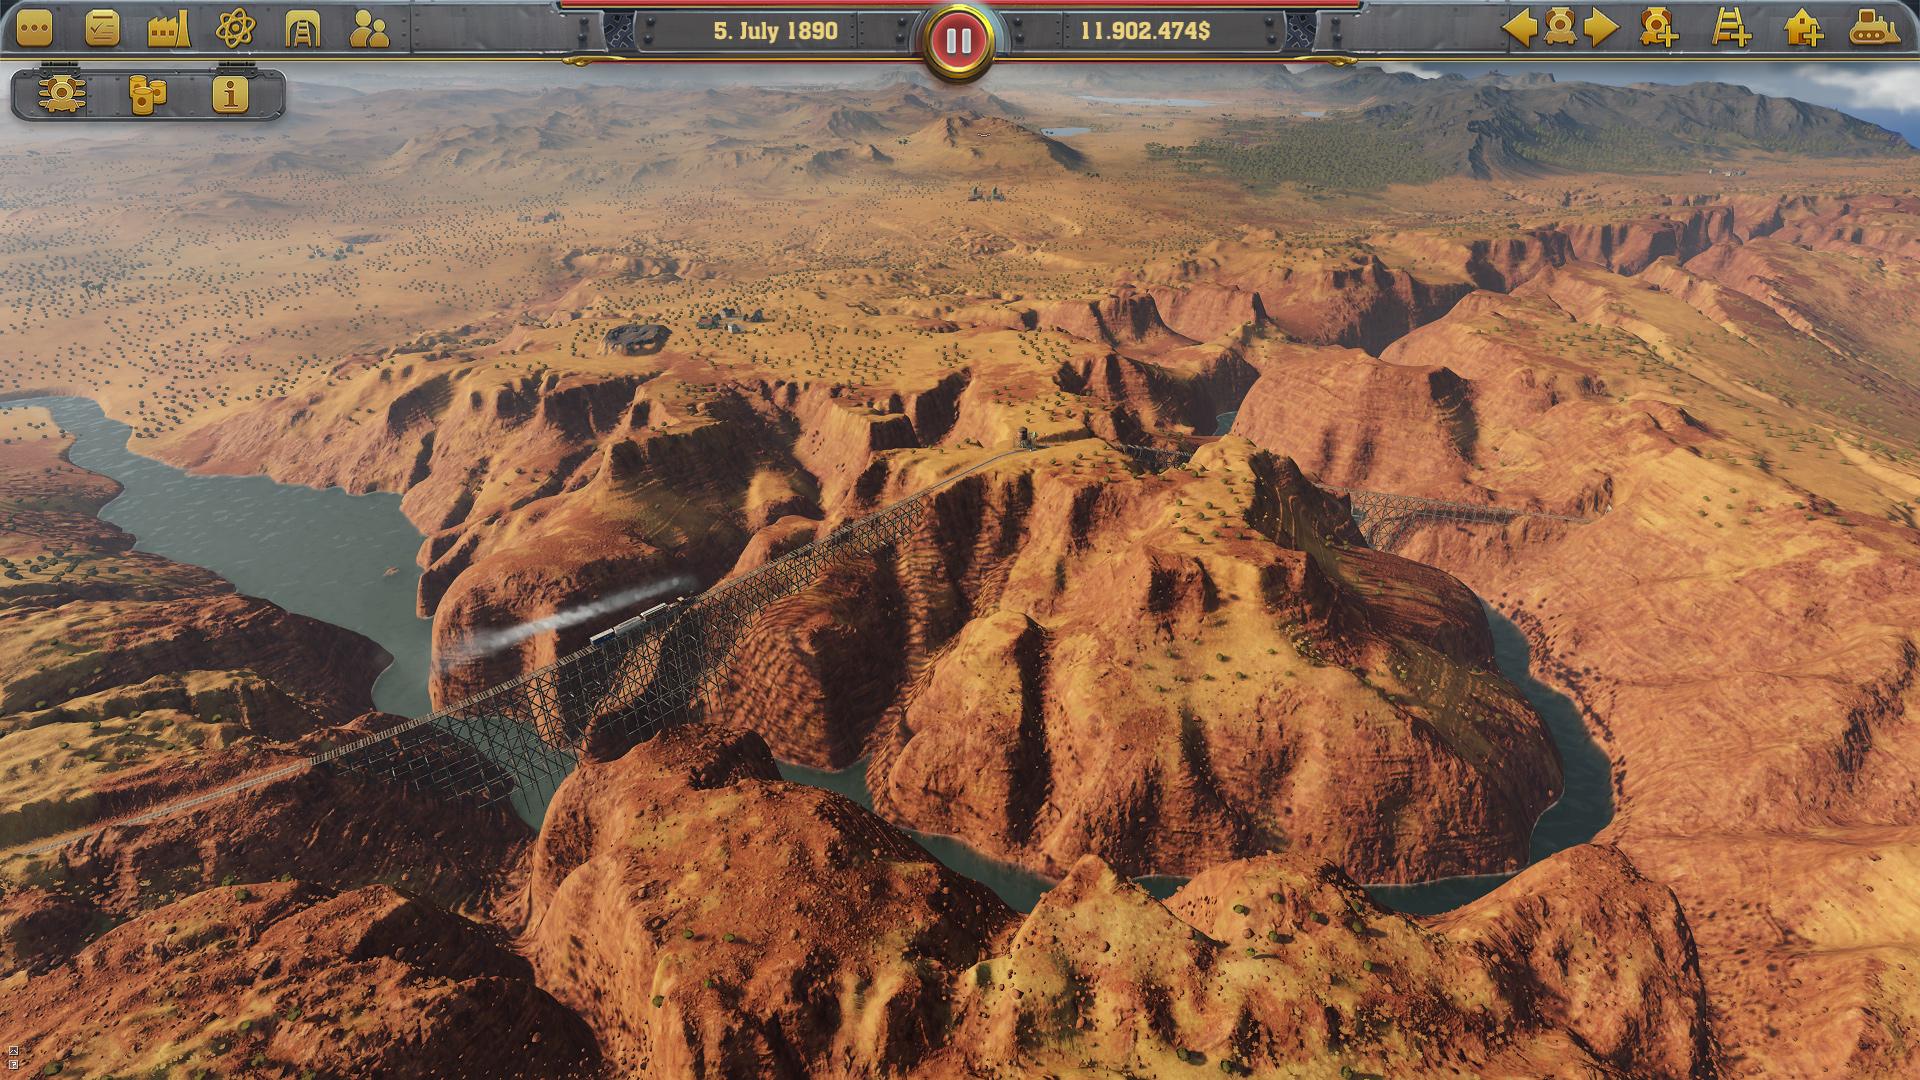 Railway Empire 05 - Railway Empire angekündigt - Tycoon-Simulation-Game